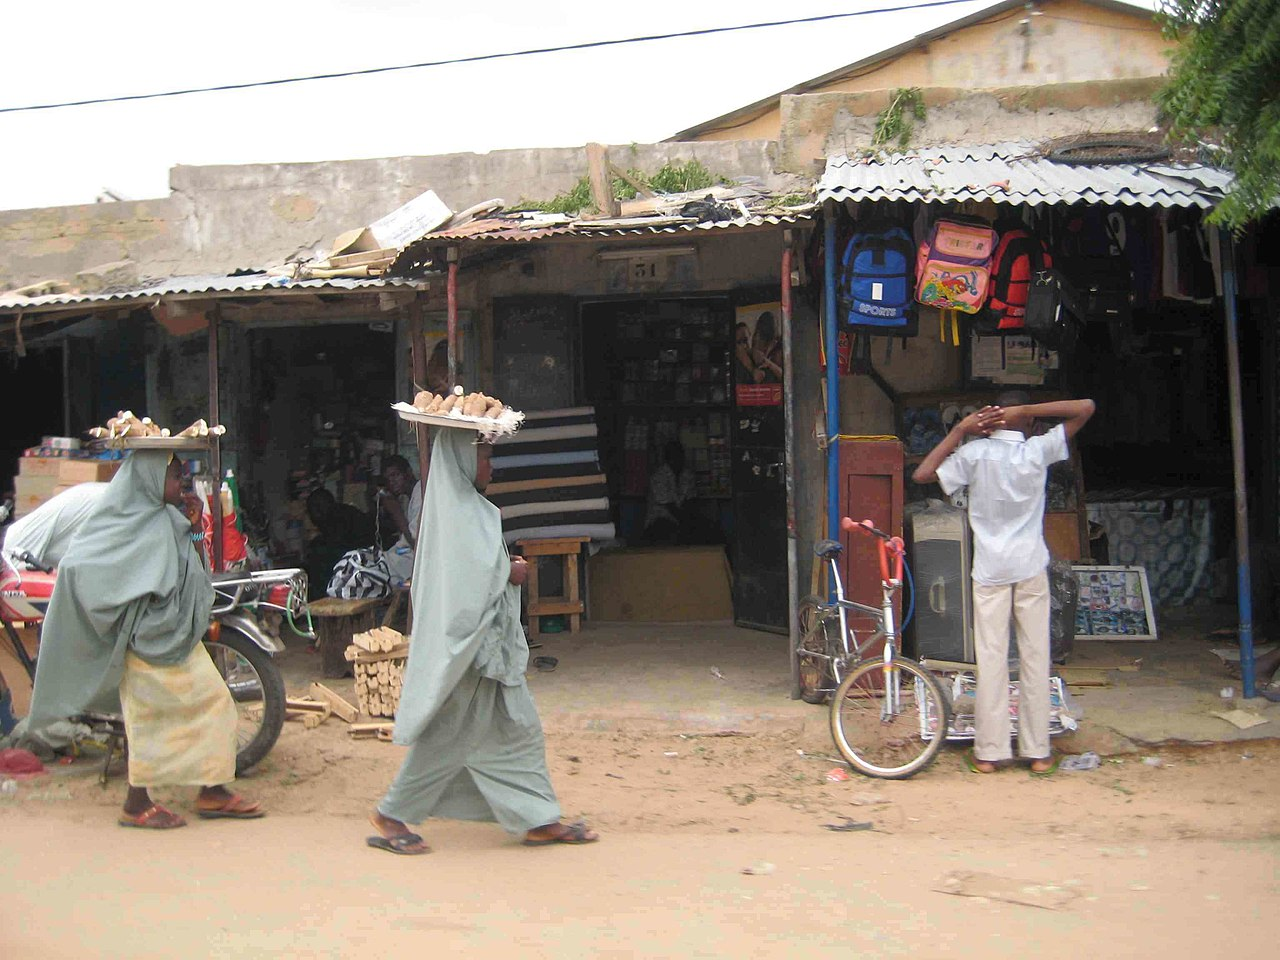 A market in Maradi.